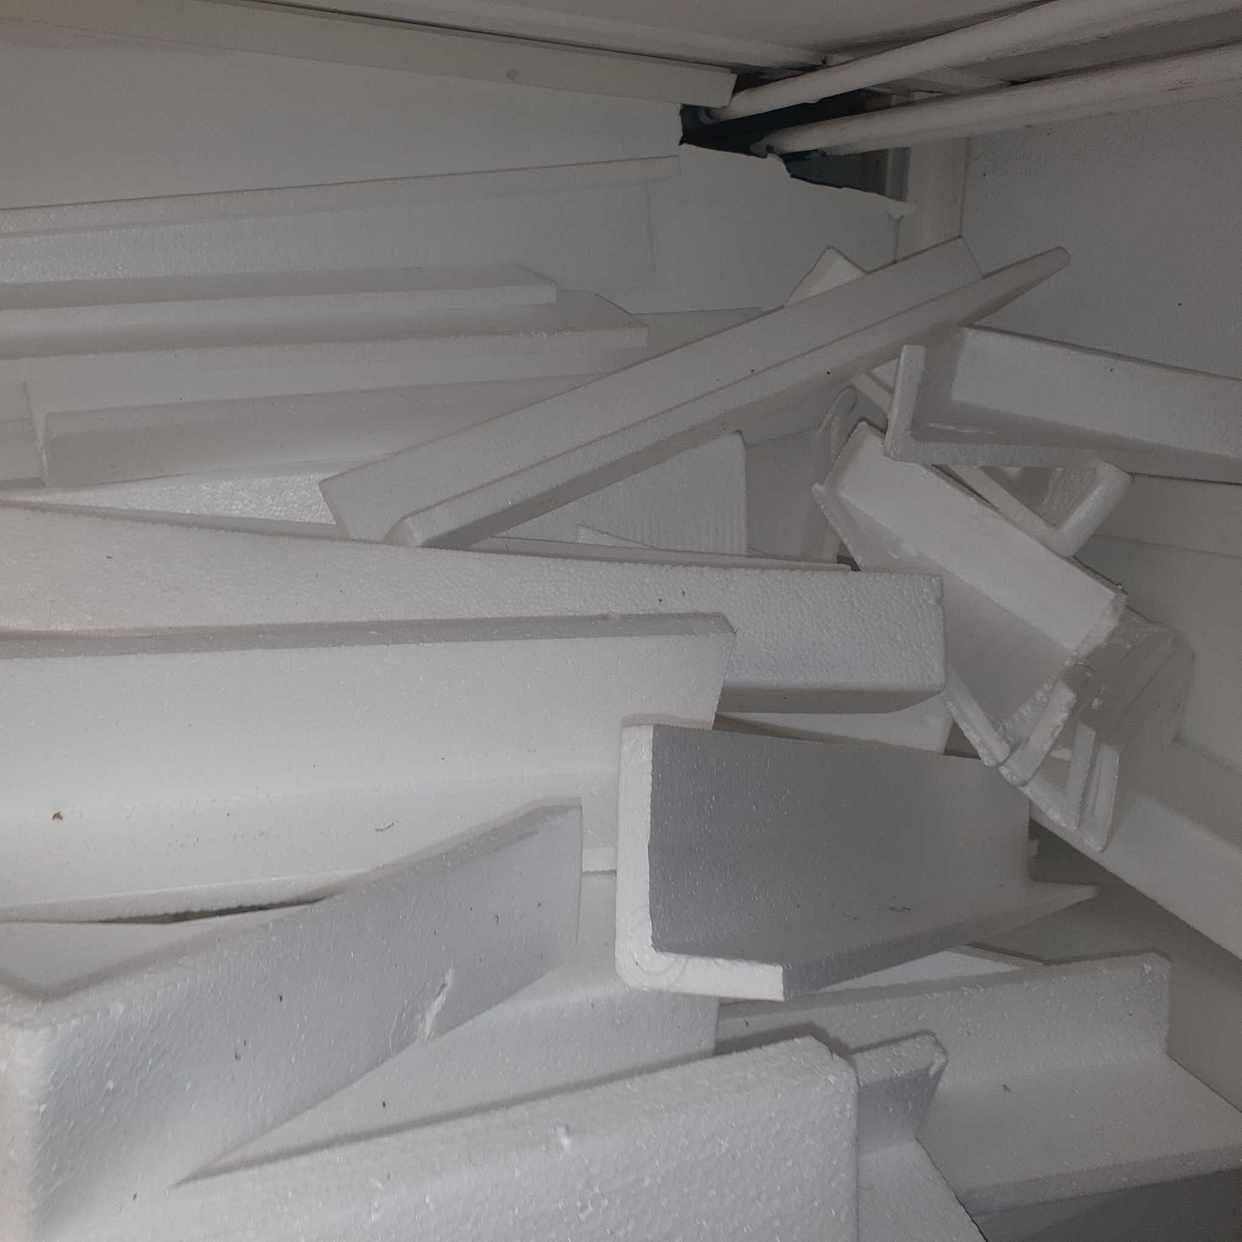 image of Kartong o embalage - Sollentuna